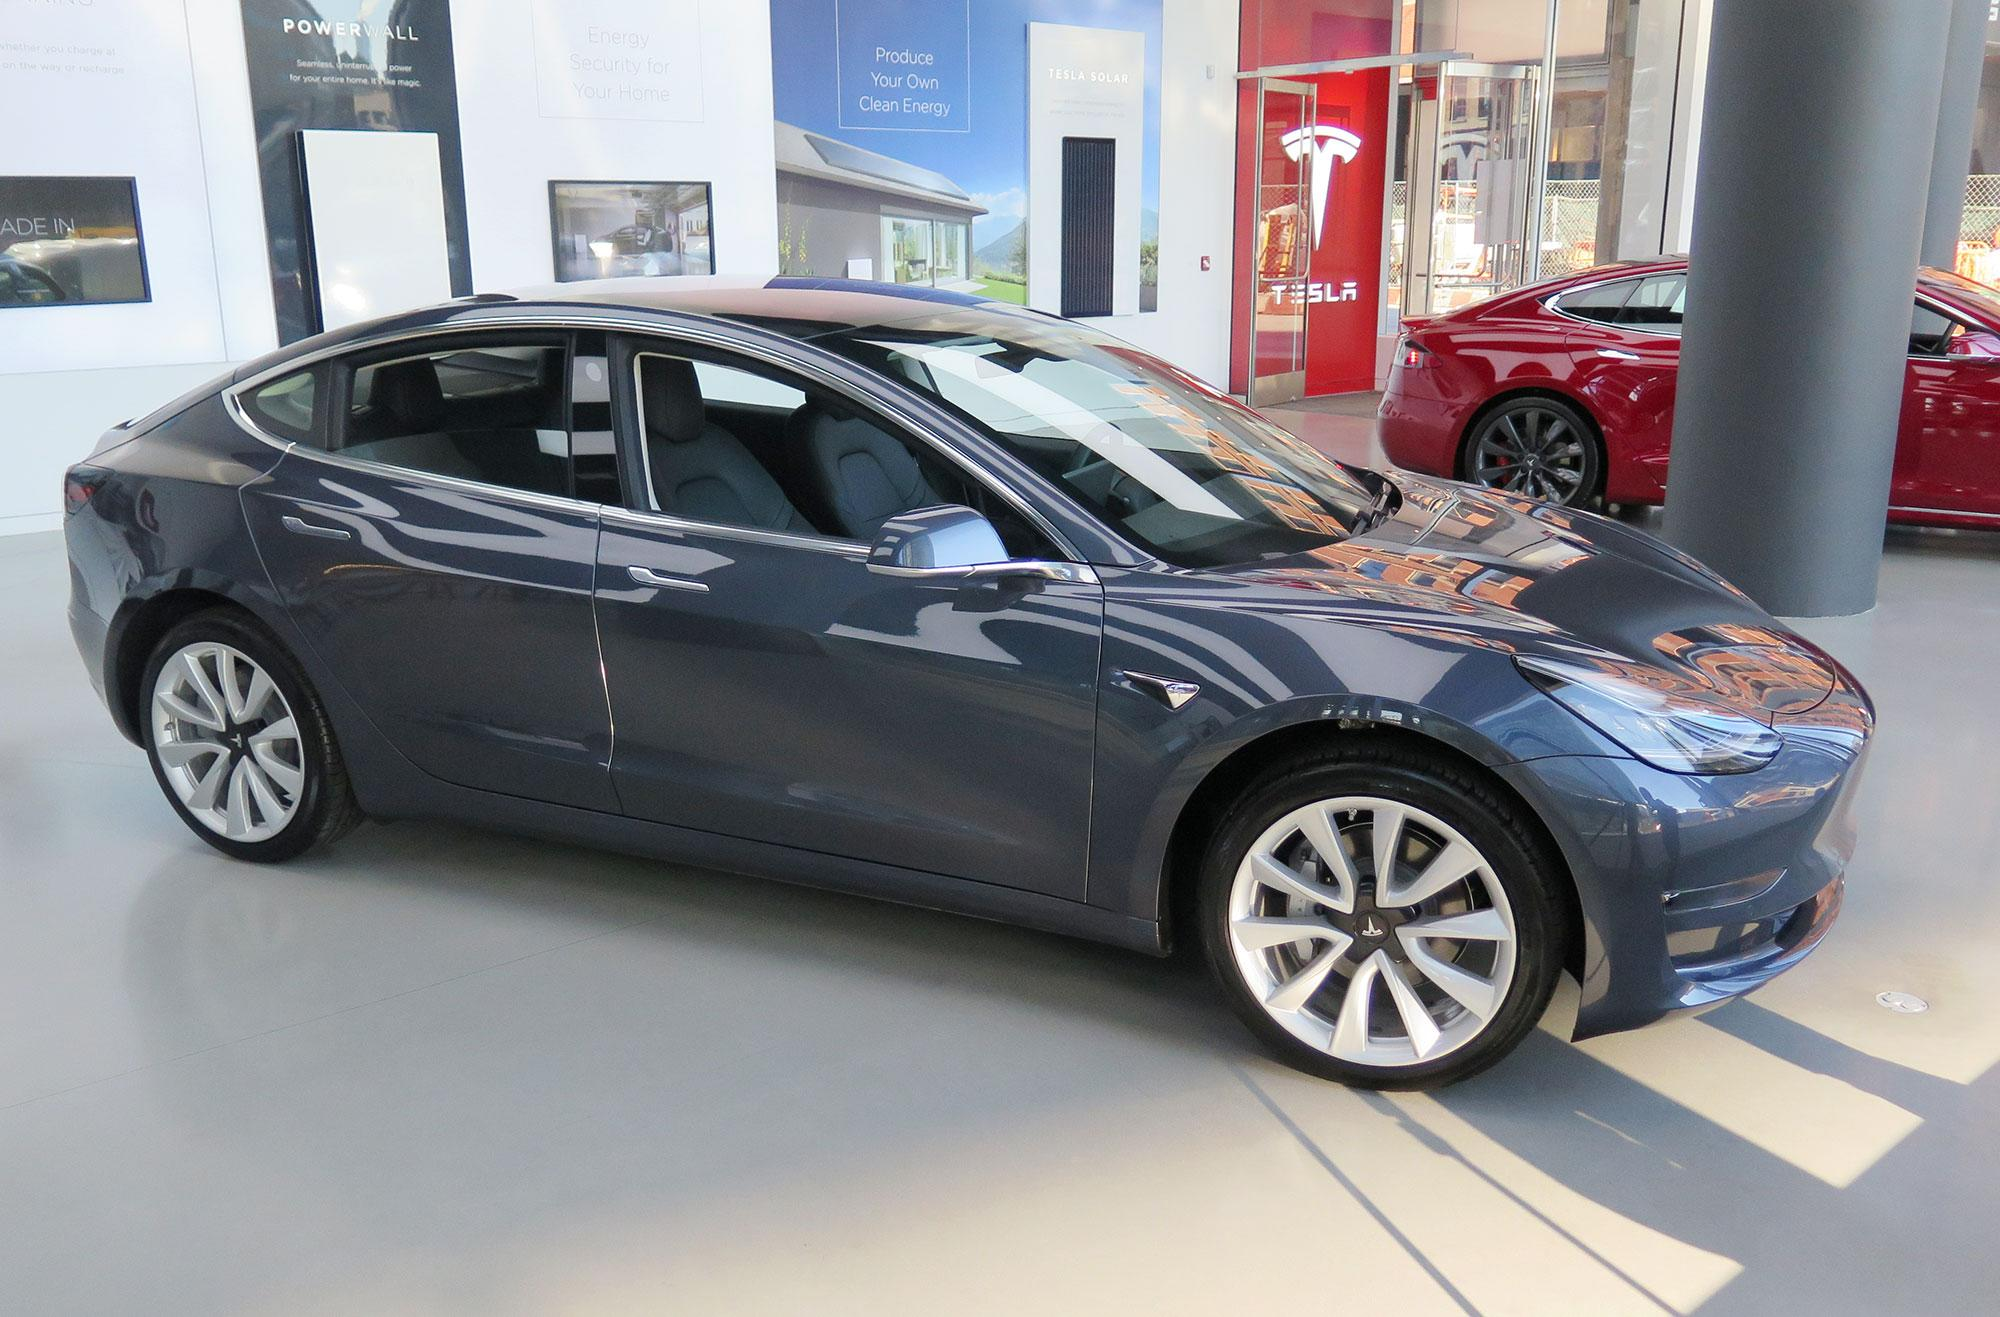 Tesla Bringing Model 3 To Three East Coast Showrooms